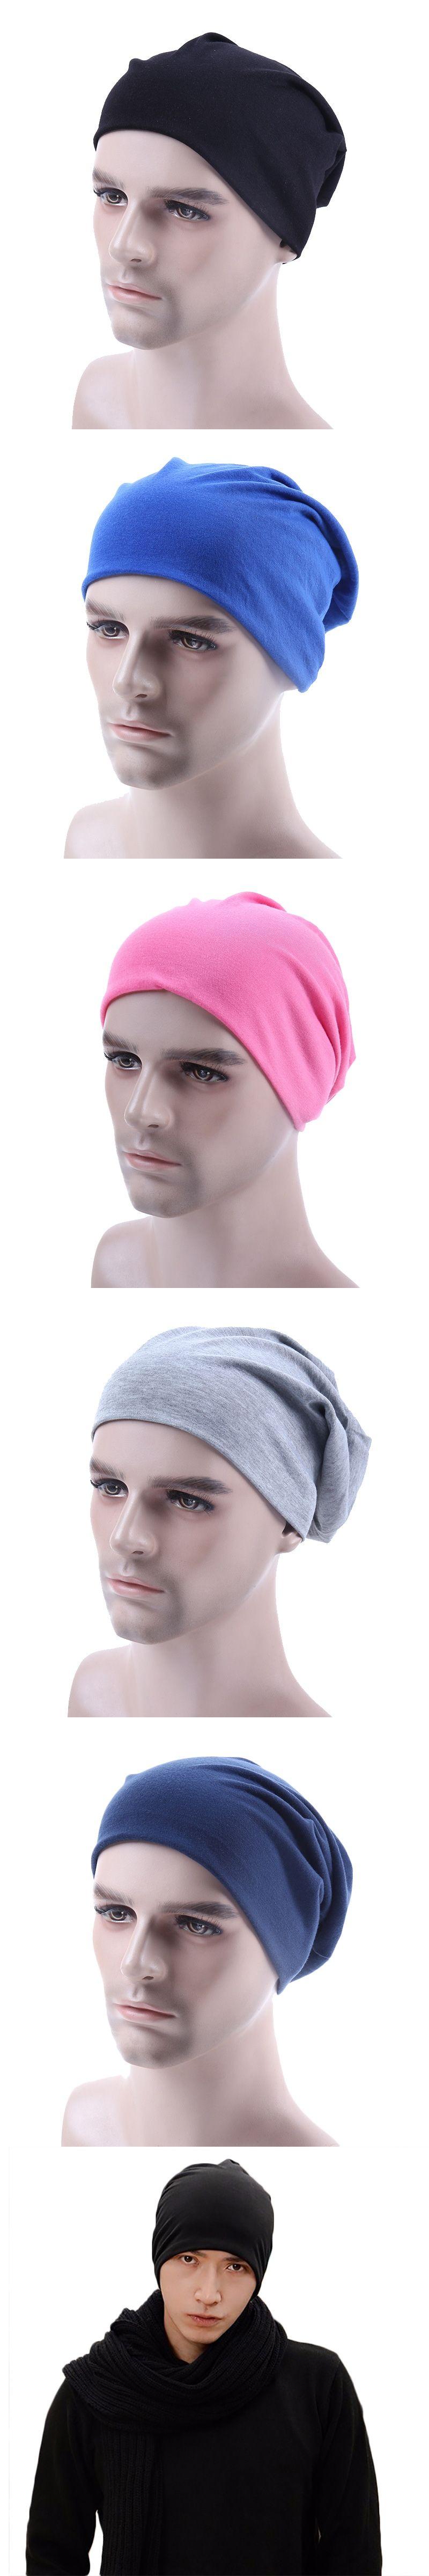 aa3cfa51493 Fashion Breathable Comfortable Spring Autumn Caps Men s Beanies  amp   Skullies Head Cap Cotton Polyester Male